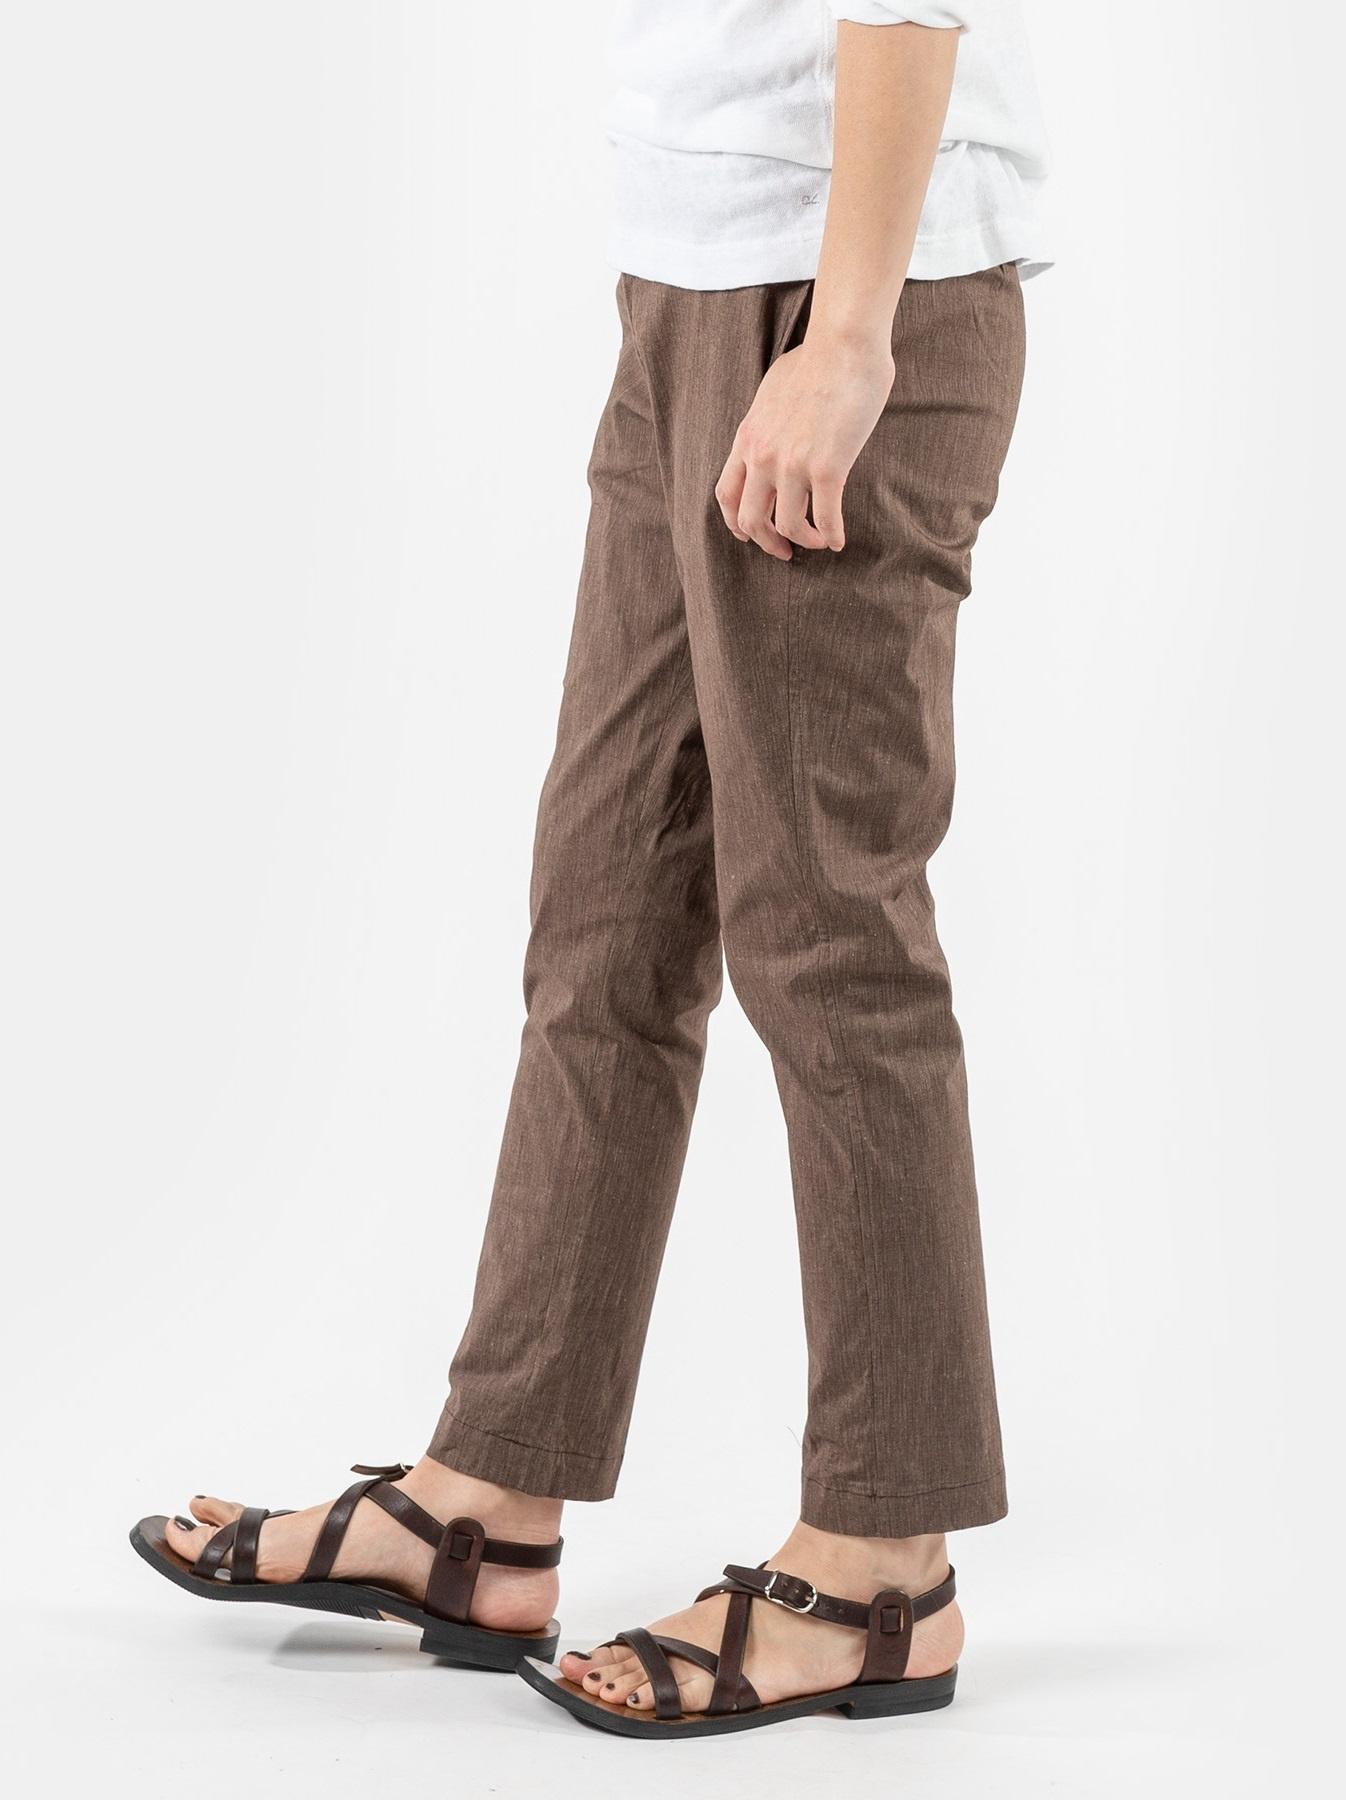 WH Cotton Linen Hakeme Stretch Pants-4